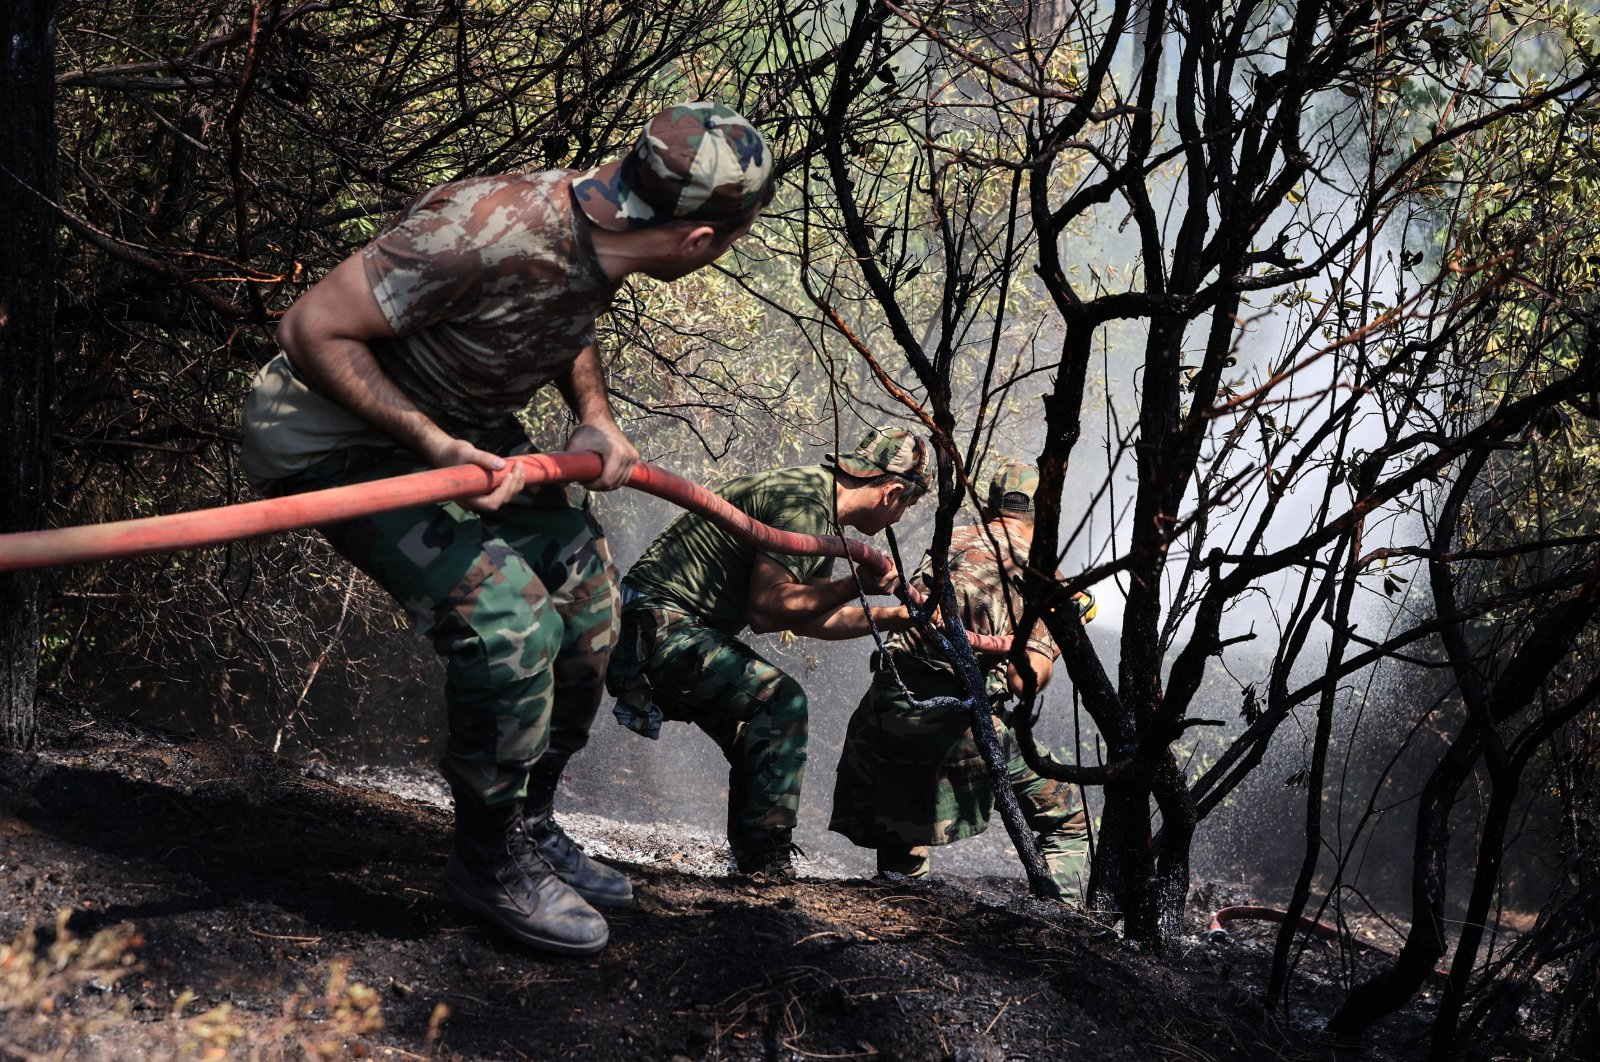 Azerbaijani firefighters help efforts to extinguish a fire in the town of Marmaris, in Muğla, southwestern Turkey, July 31, 2021. (AA PHOTO)